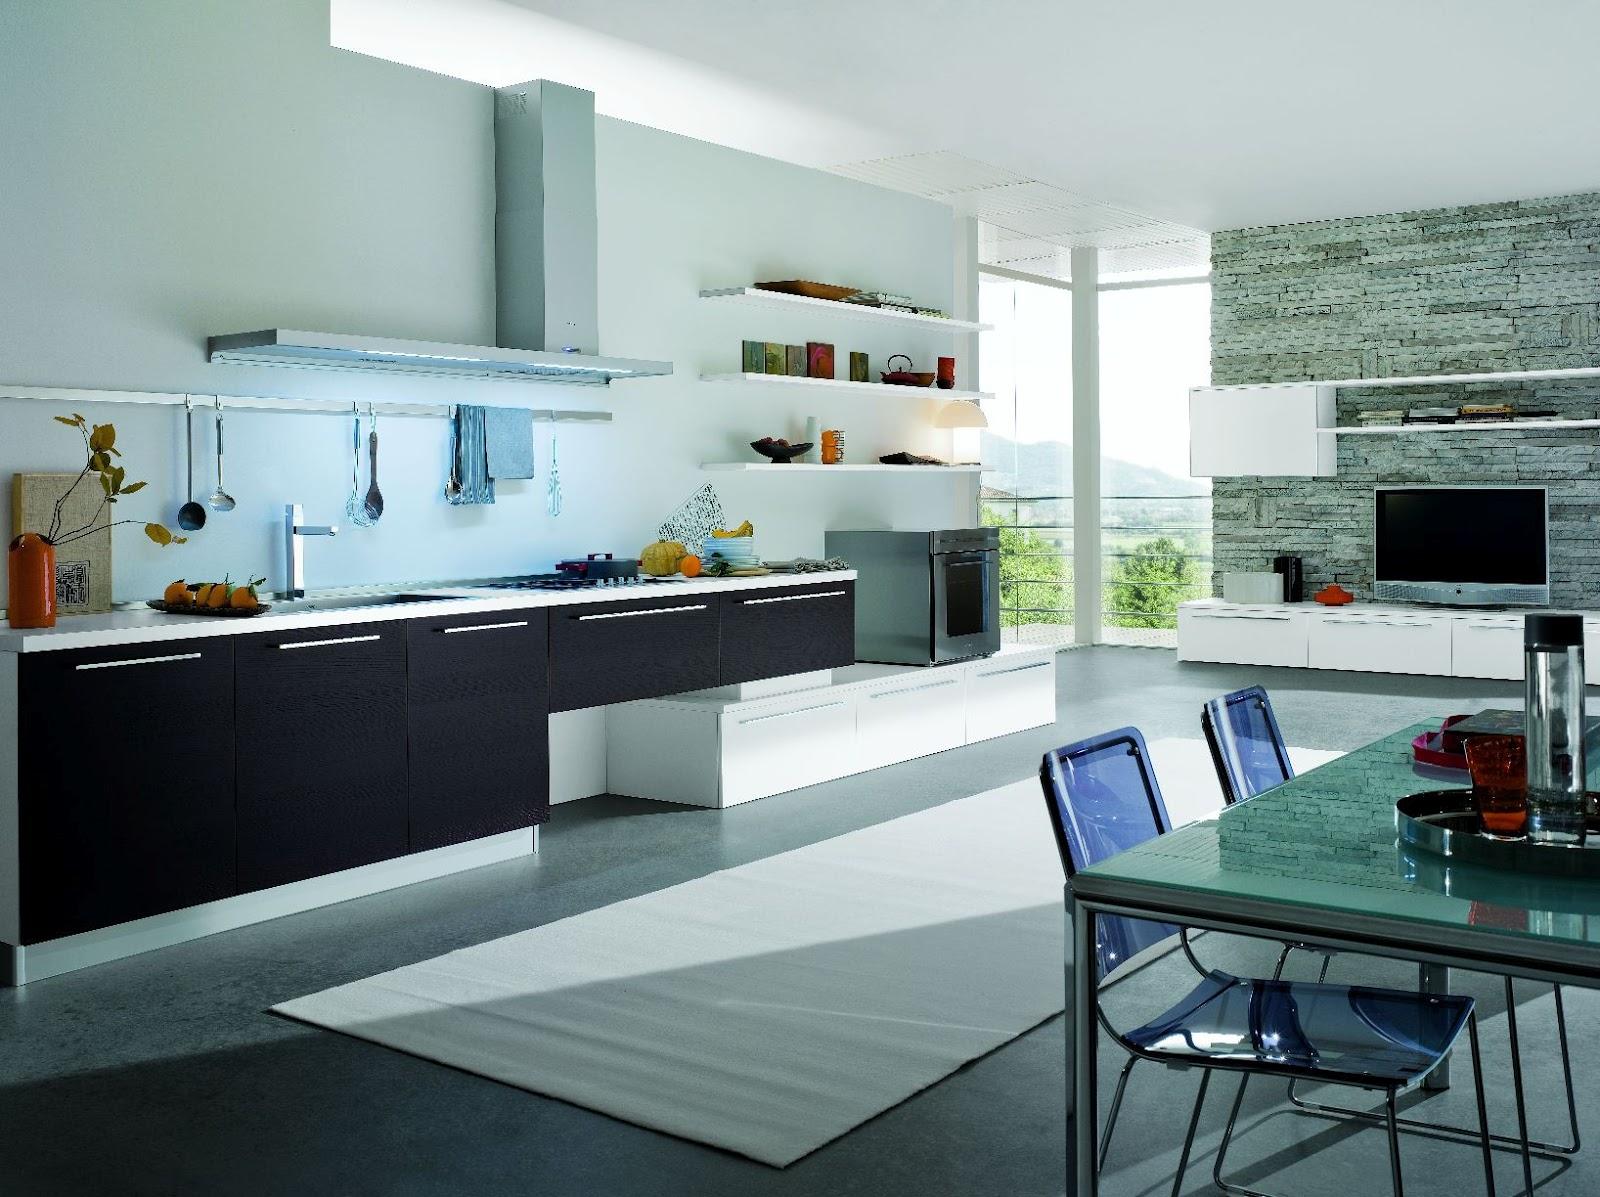 cuisine design ouverte sur le salon gara cuisine. Black Bedroom Furniture Sets. Home Design Ideas